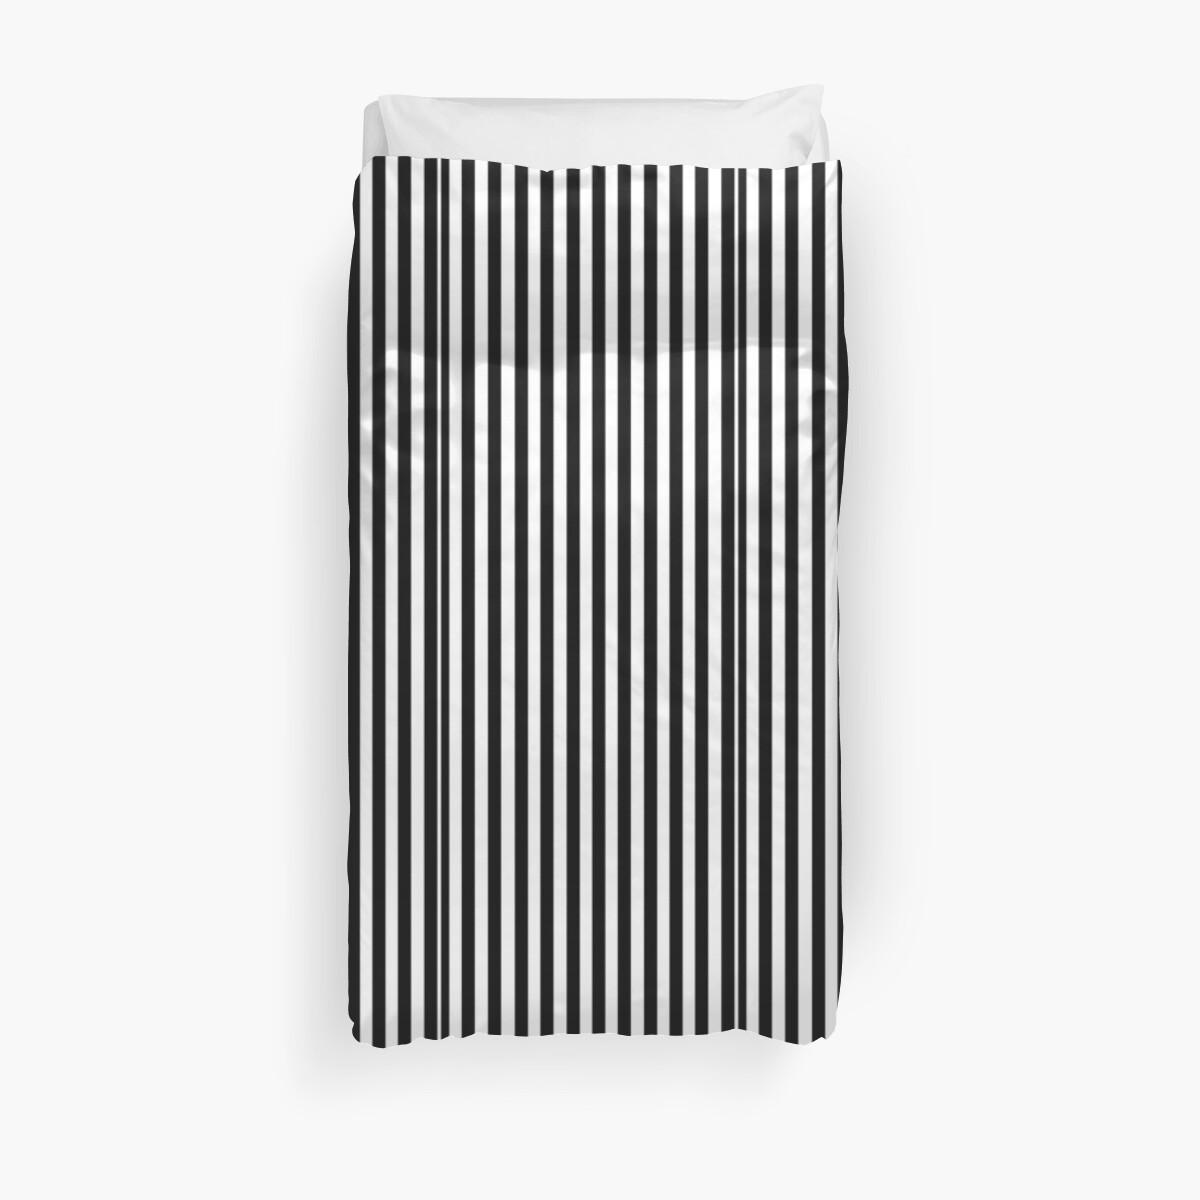 Black White Striped Pillow Cushion Cover Skirt by deanworld